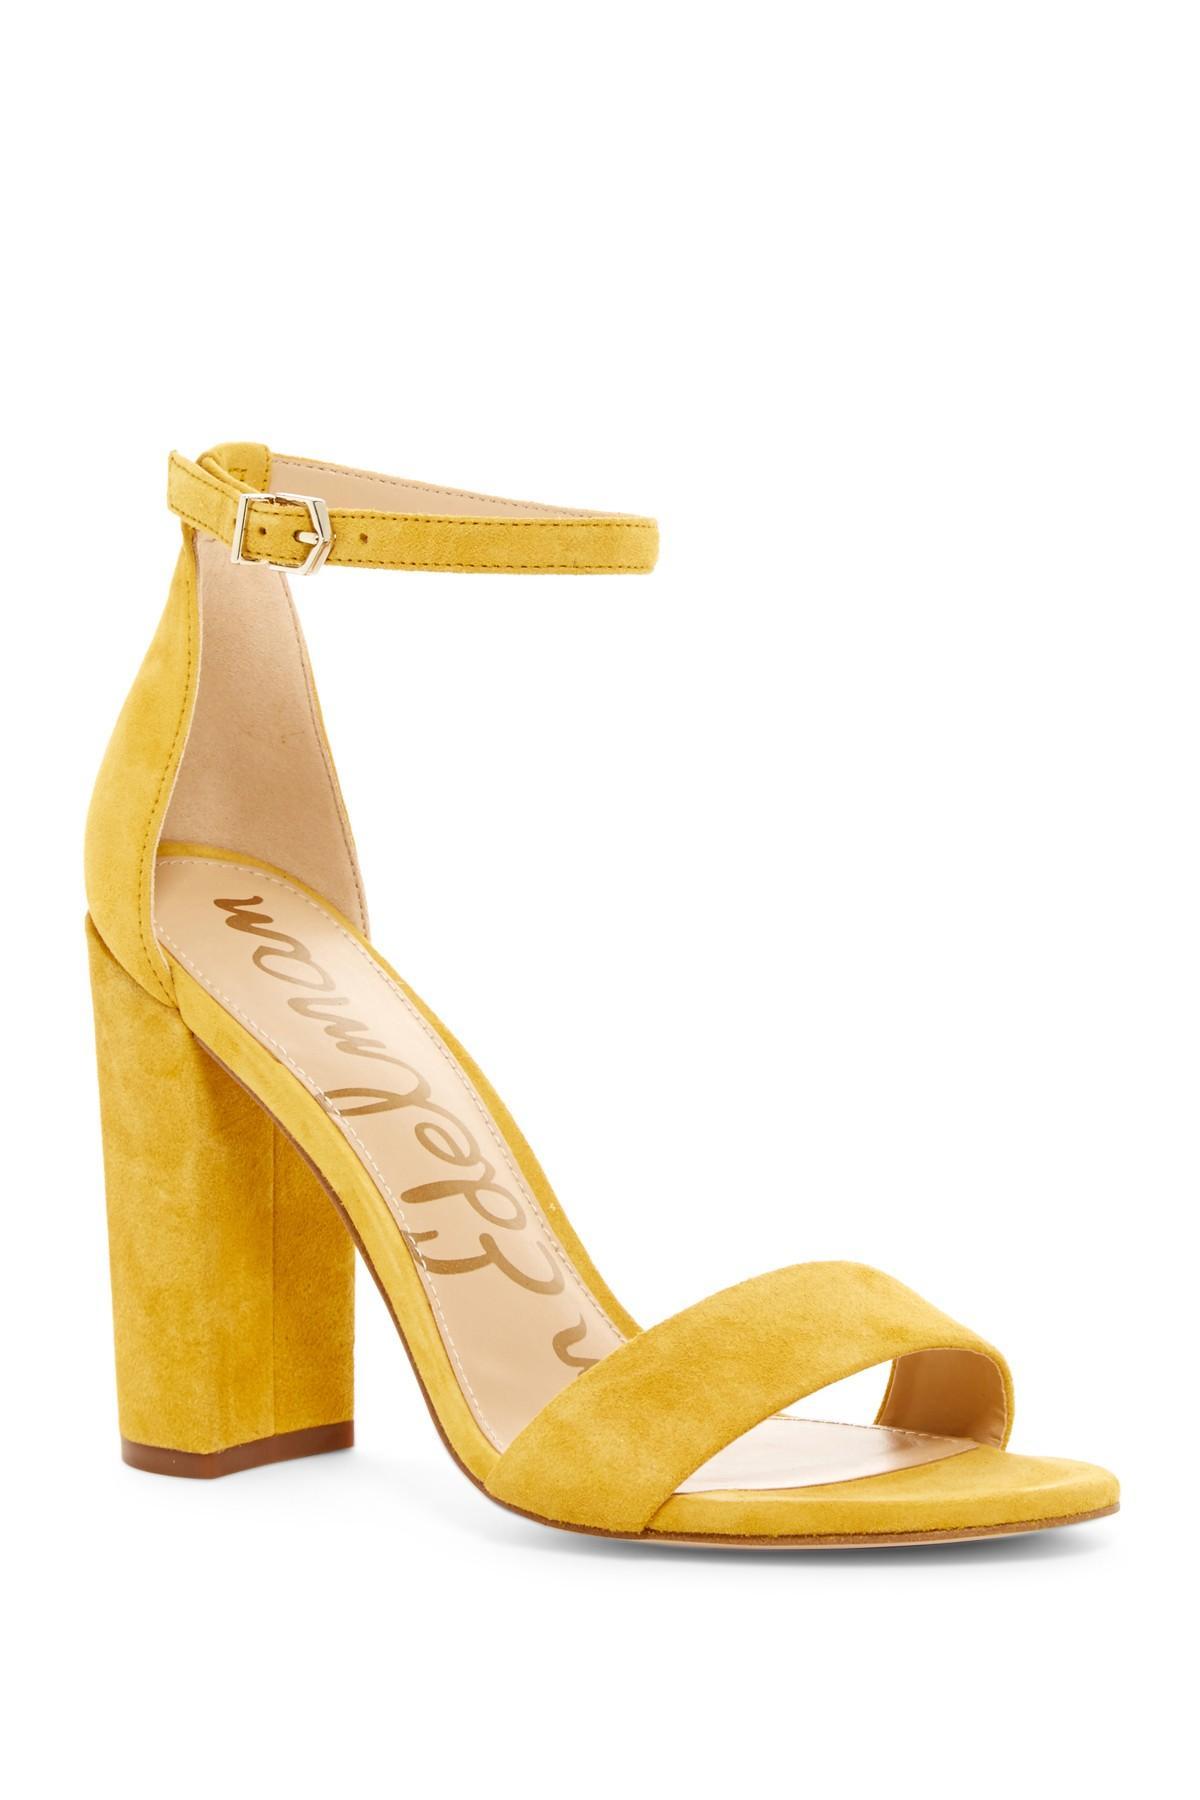 c3f20334ce64 Lyst - Sam Edelman Yaro Heel in Yellow